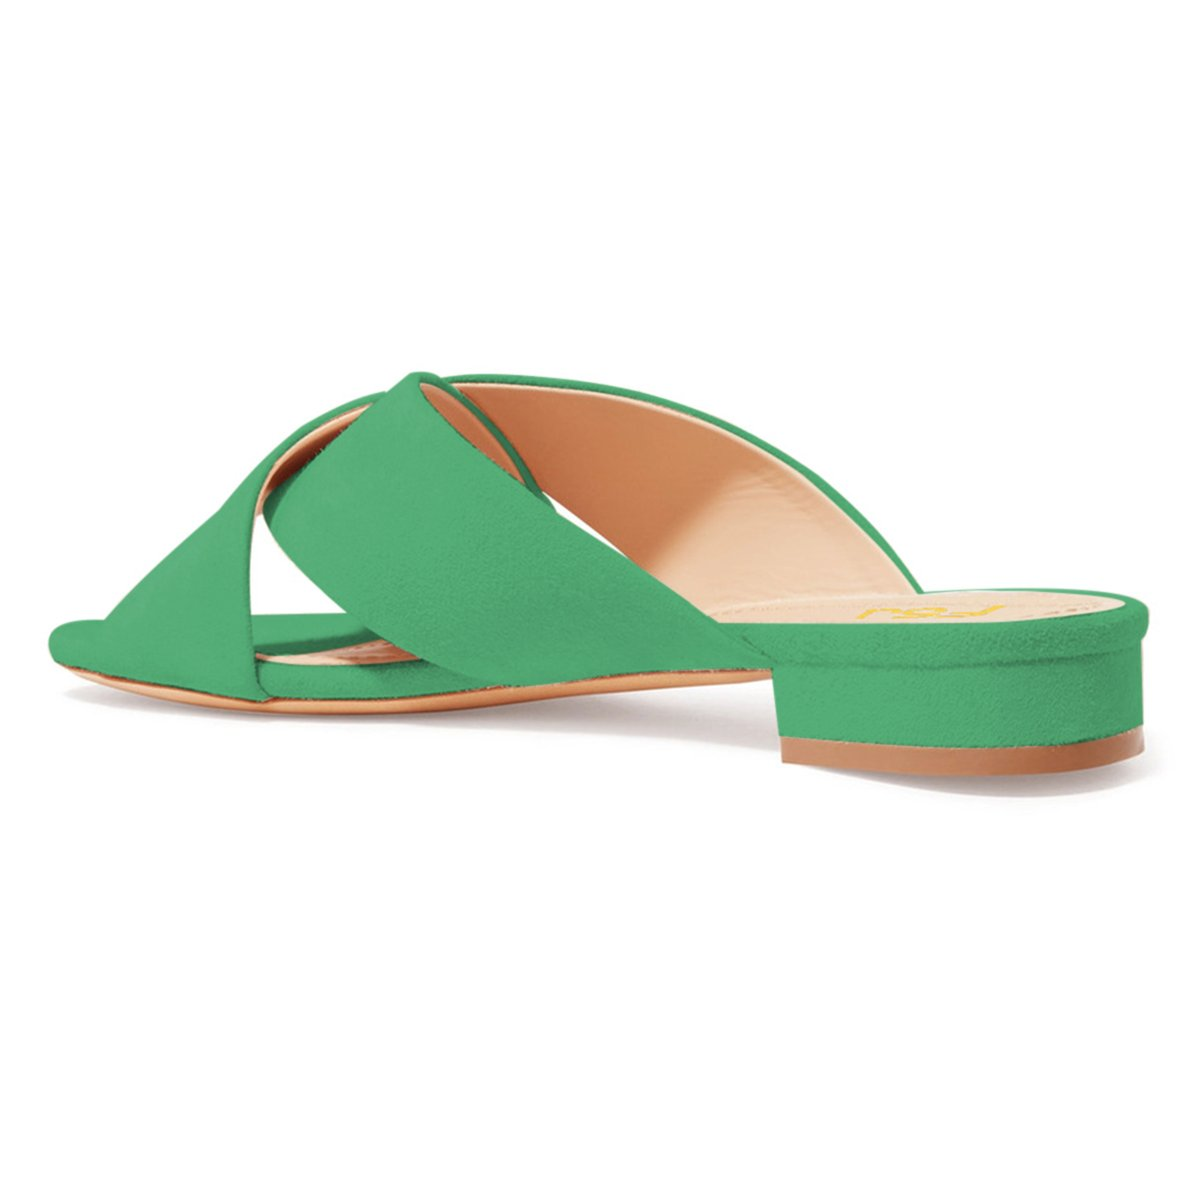 FSJ Women Comfortable Cross Strap Sandals Low Heels Mules Slide Casual Flats Shoes Size 4-15 US B07CTJ4G73 7 B(M) US|Green